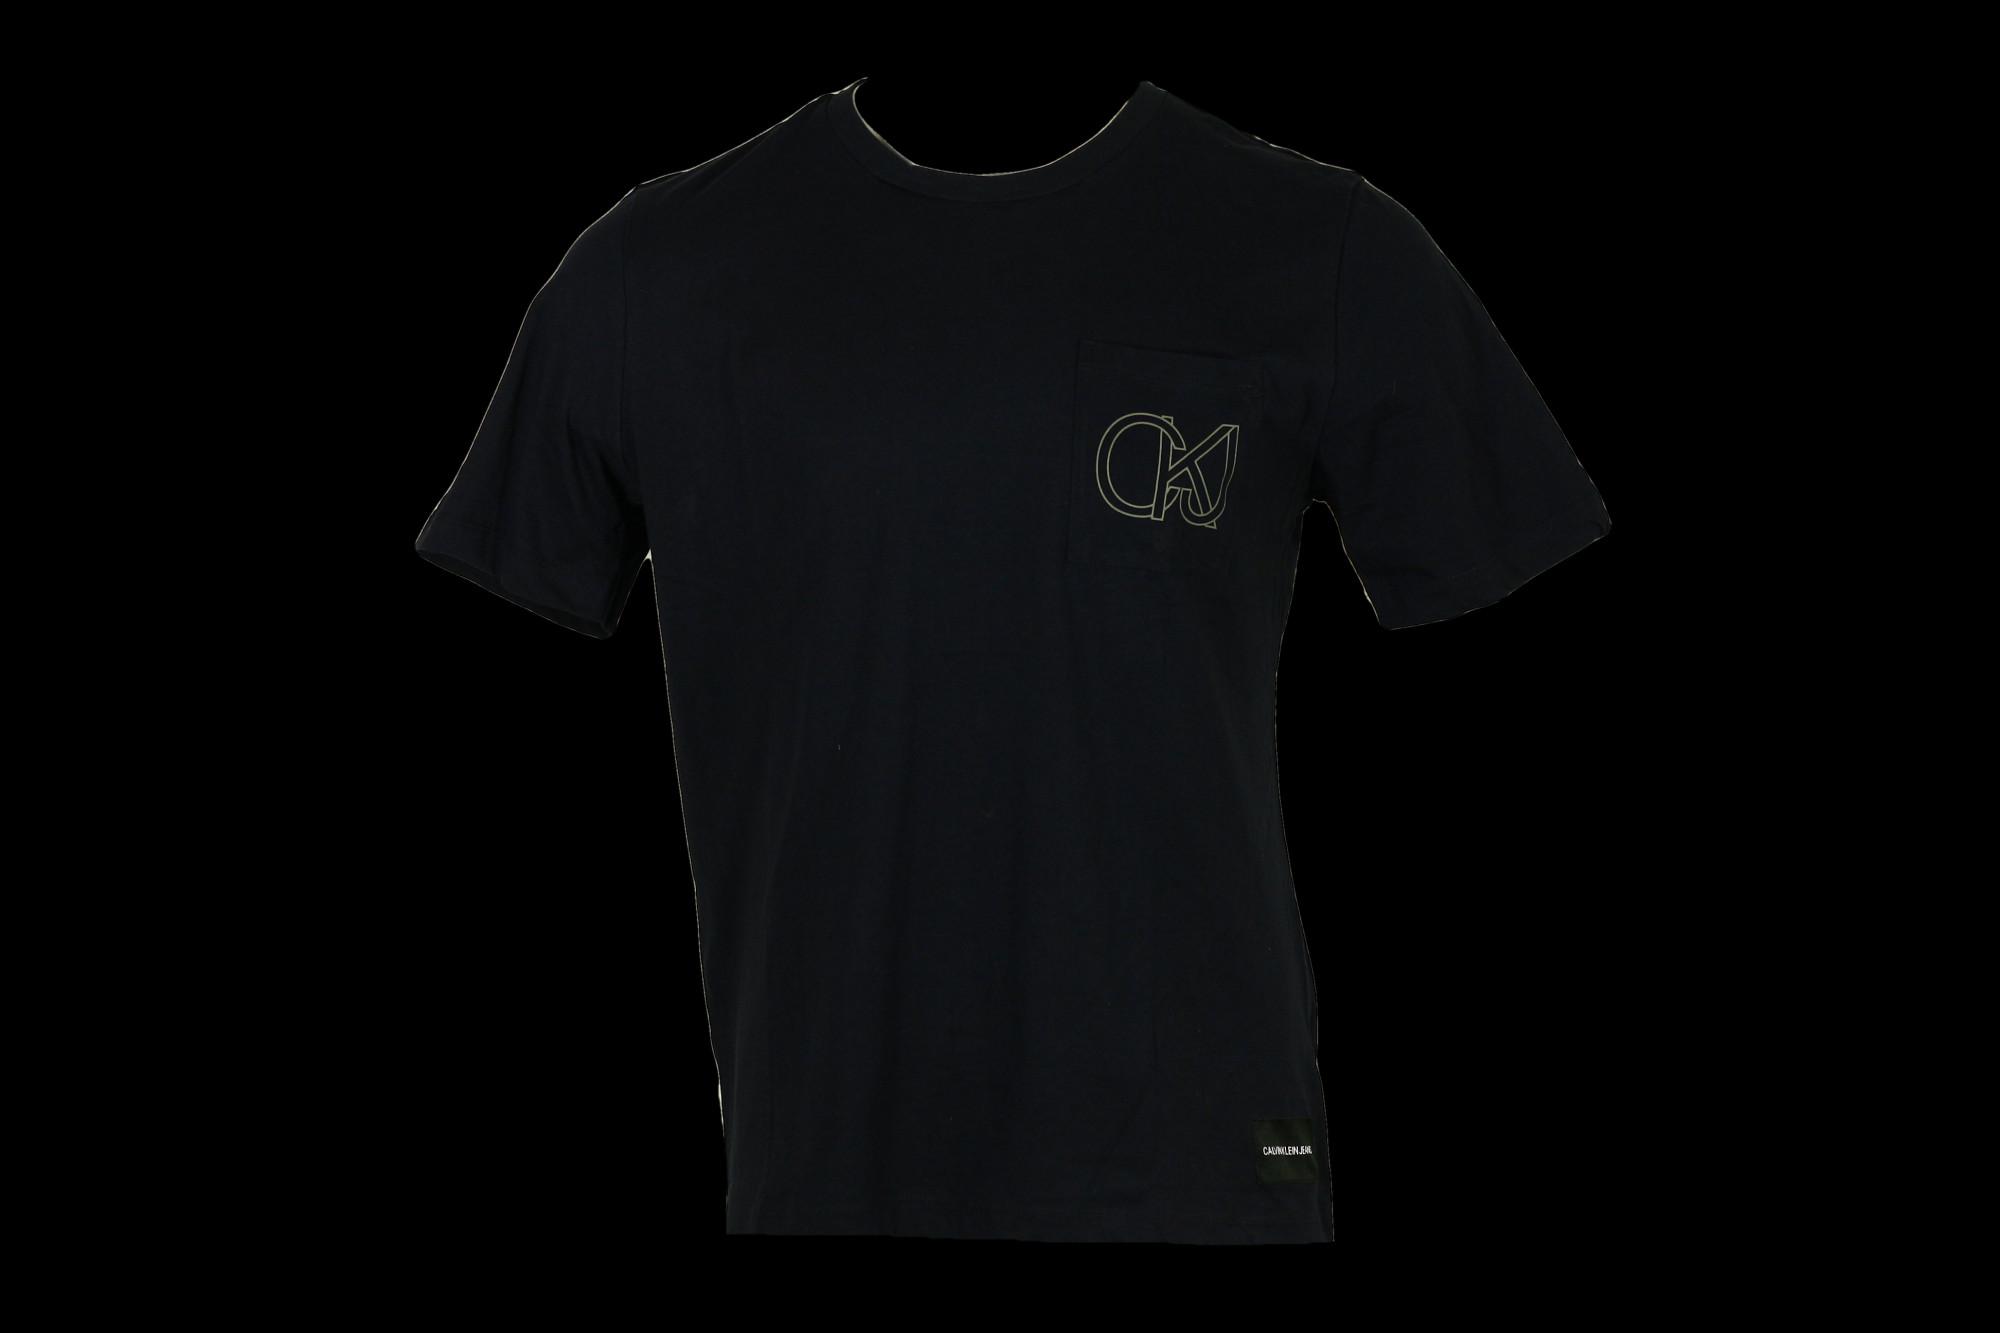 Pánské tričko OU48 tmavě modrá - Calvin Klein tmavě modrá S